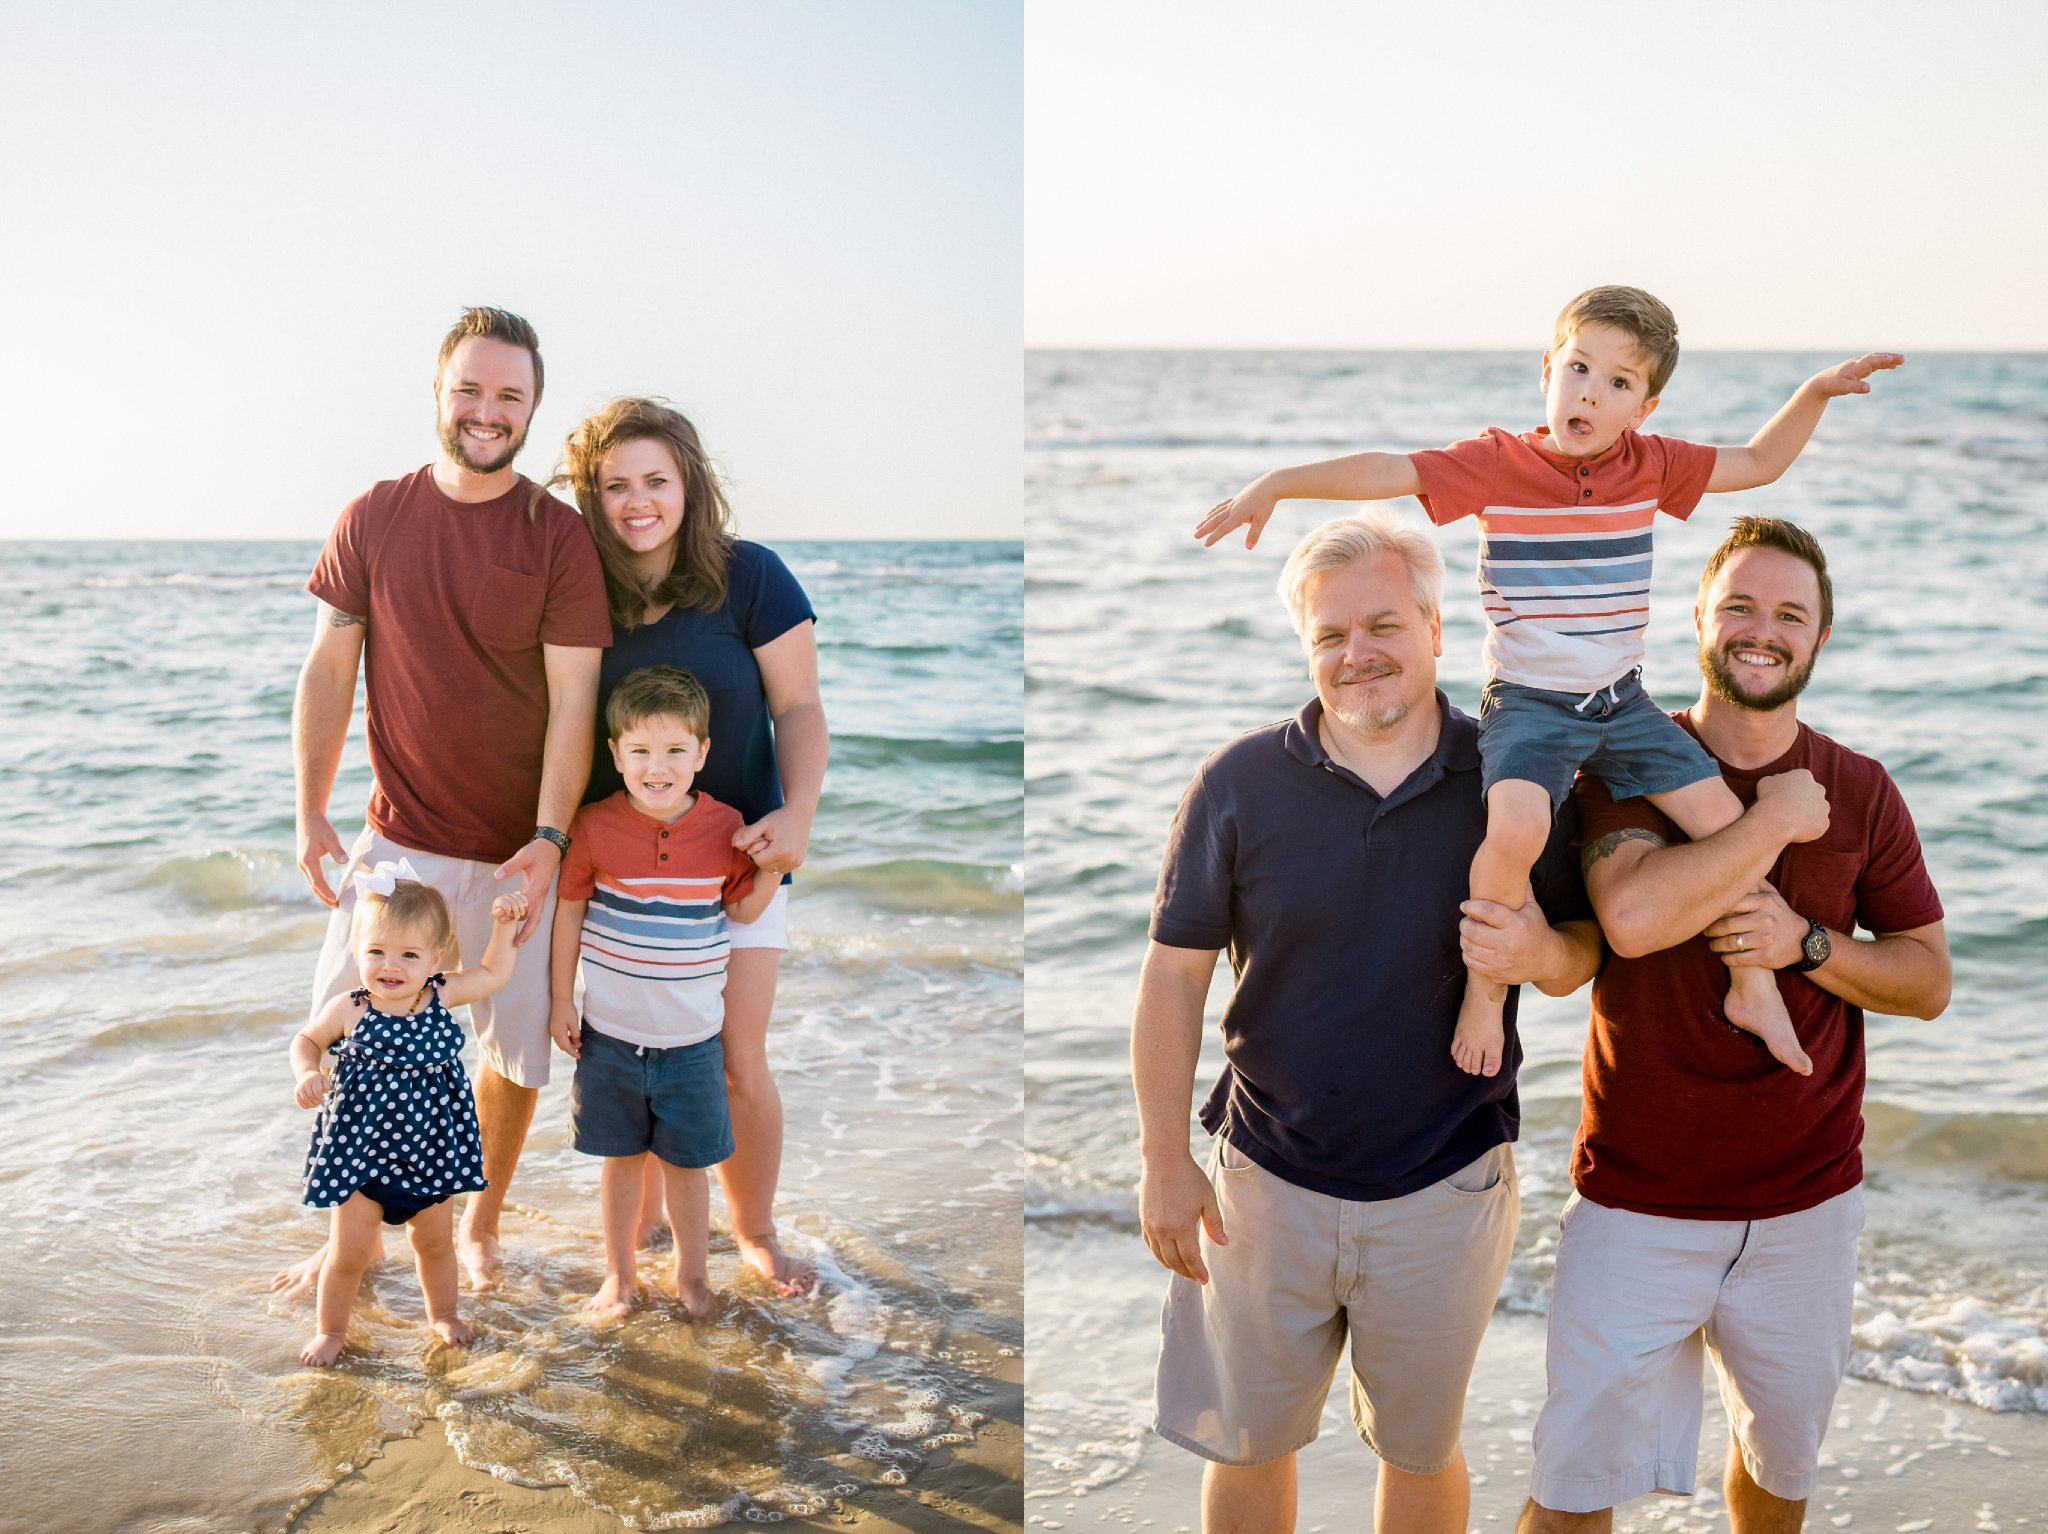 Caesarea-israel-beach-family-session-kate-giryes-photography-4_WEB-1.jpg